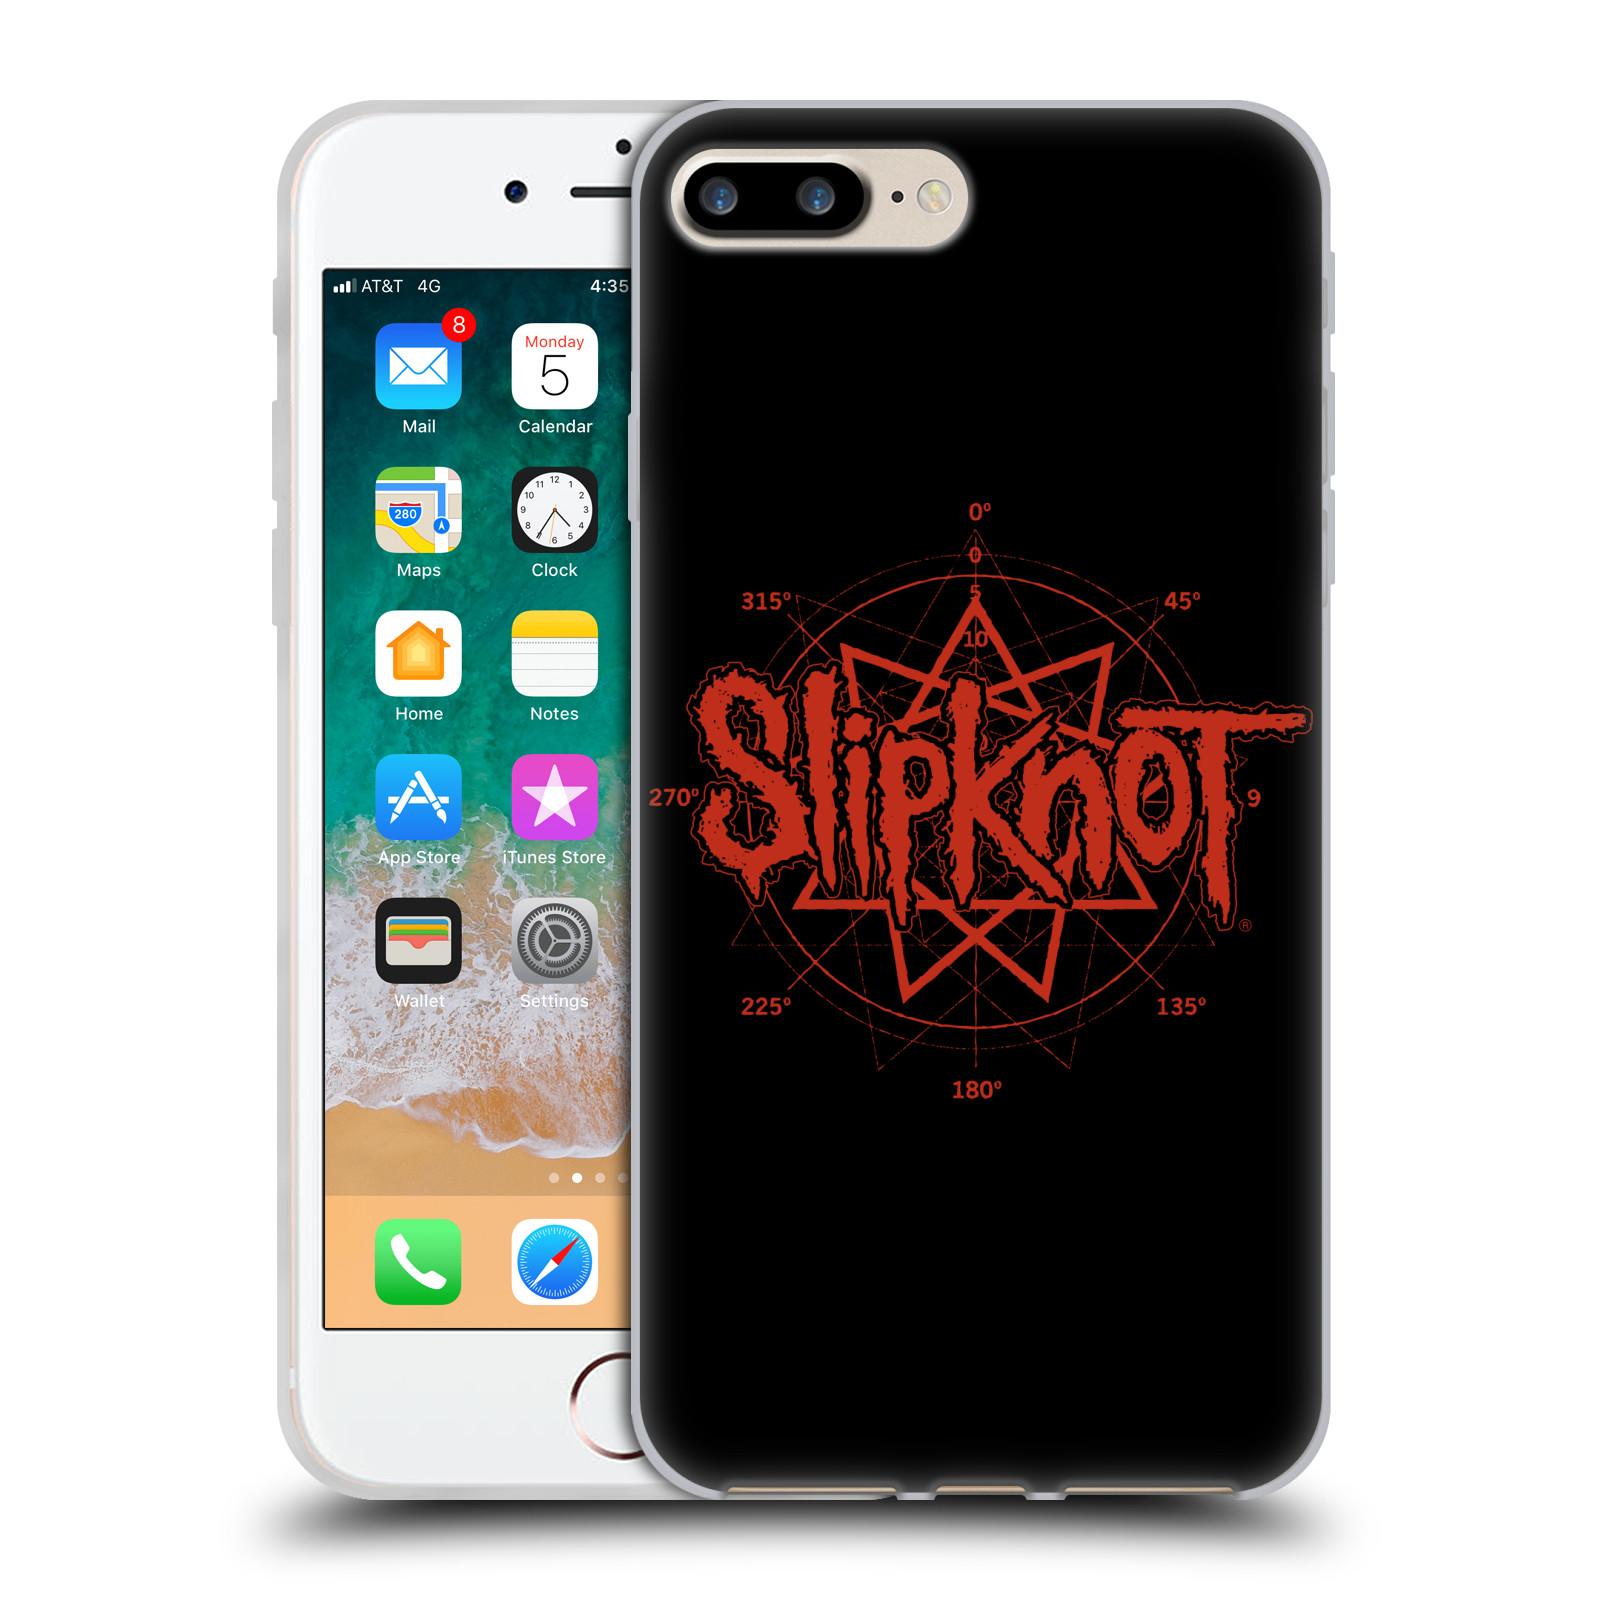 HEAD CASE silikonový obal na mobil Apple Iphone 7 PLUS hudební skupina Slipknot logo